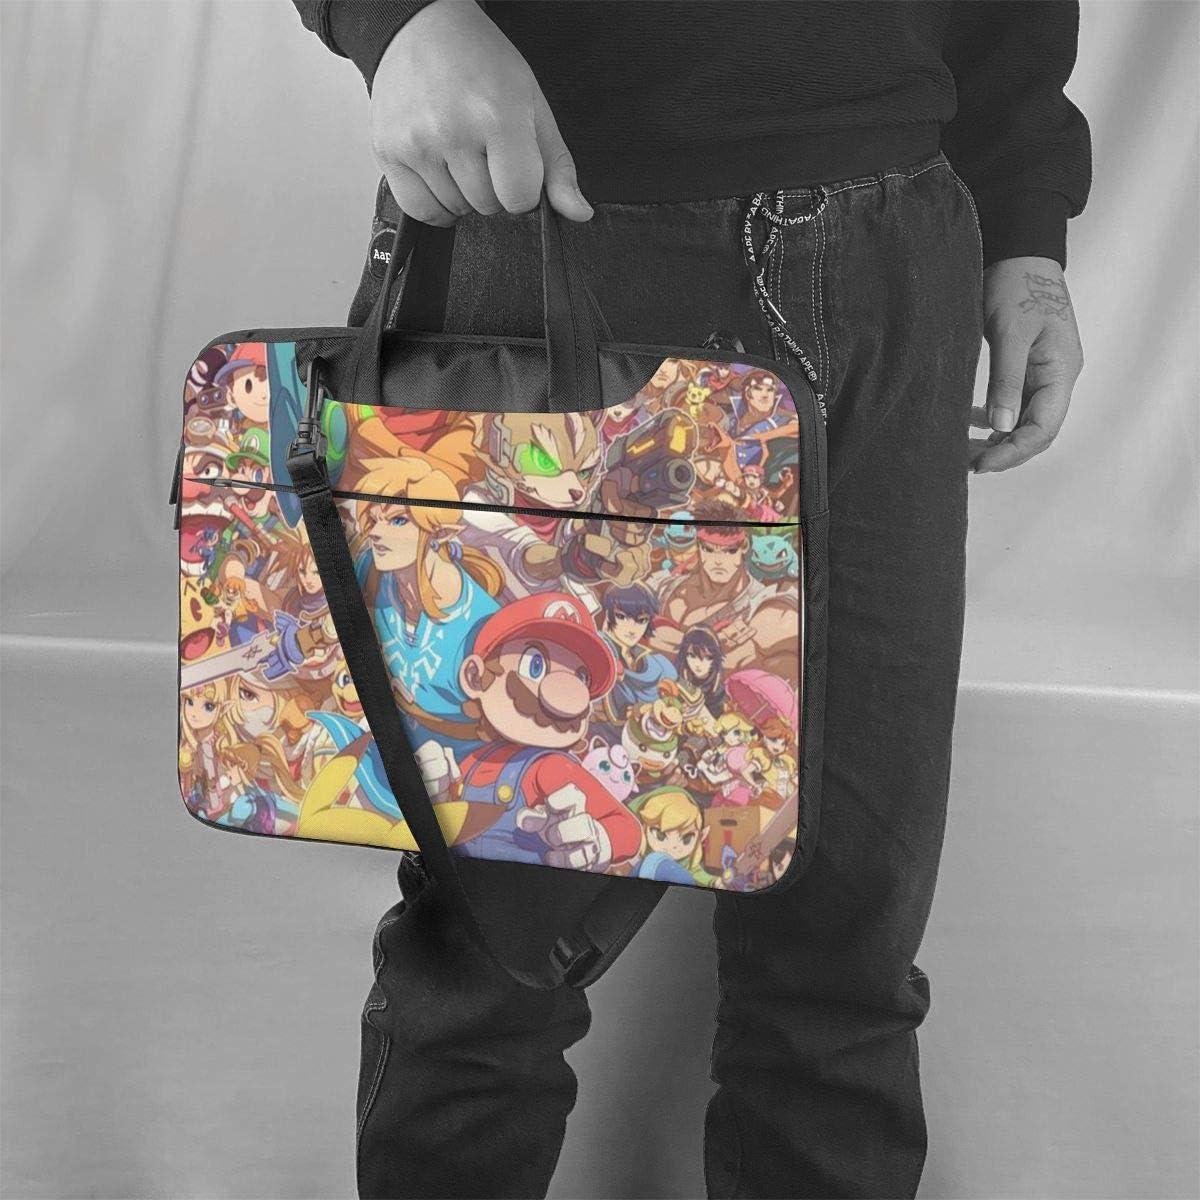 Super Mario The Legend of Zelda Kirby Laptop Sleeve Case Handheld One Shoulder Shockproof Oxford Protective Case//Notebook Computer Pocket Case//Tablet Briefcase Carrying Bag Compatible-14 inch